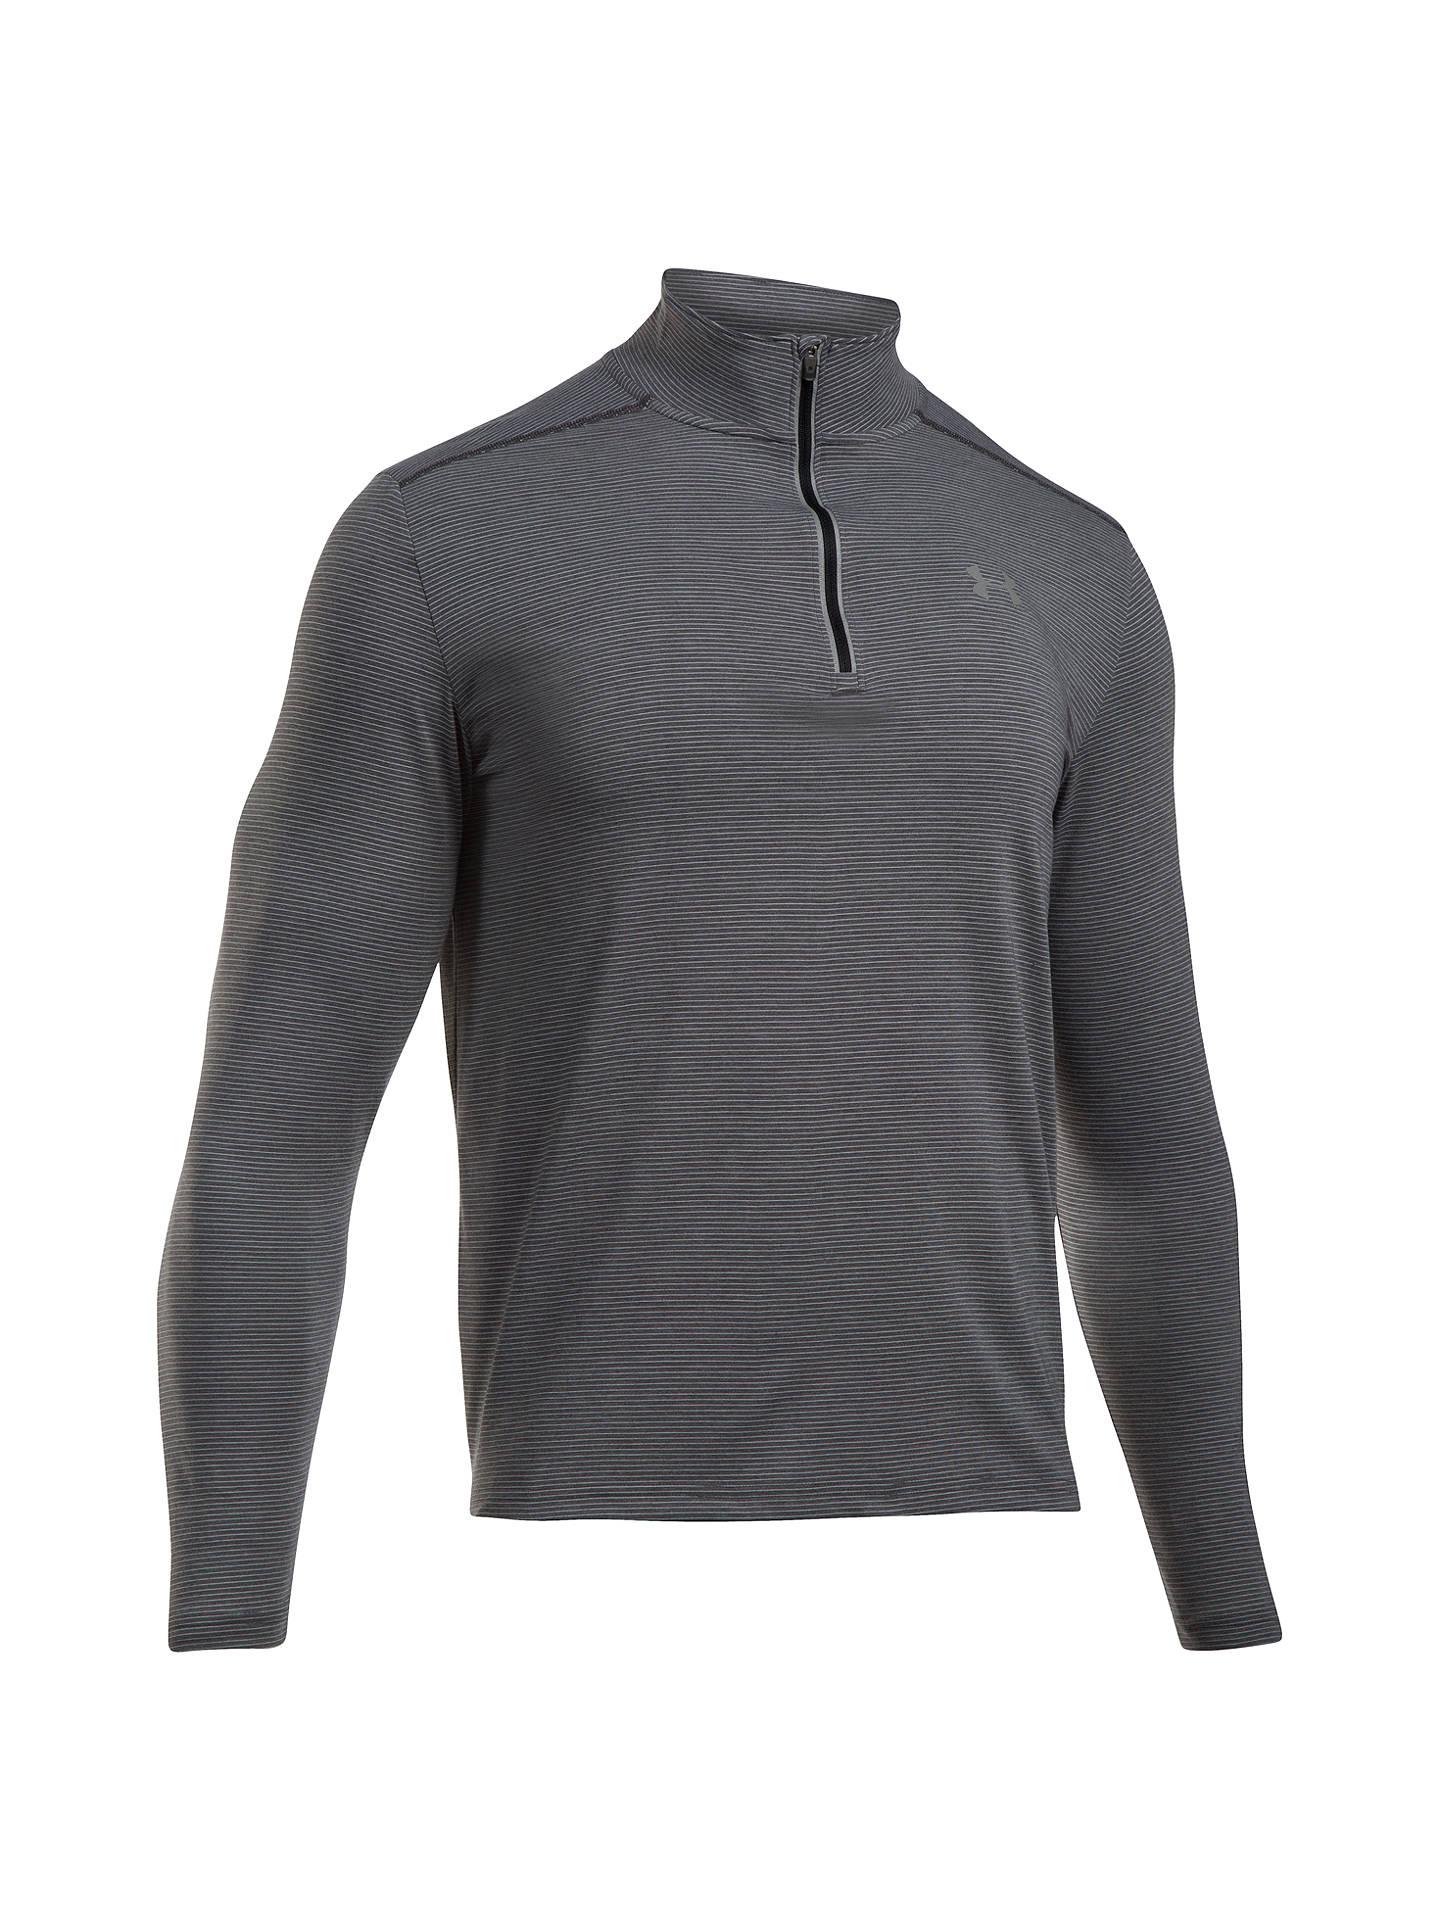 66622b4c6 Buy Under Armour Threadborne Streaker Long Sleeve Running T-Shirt, Grey, S  Online ...